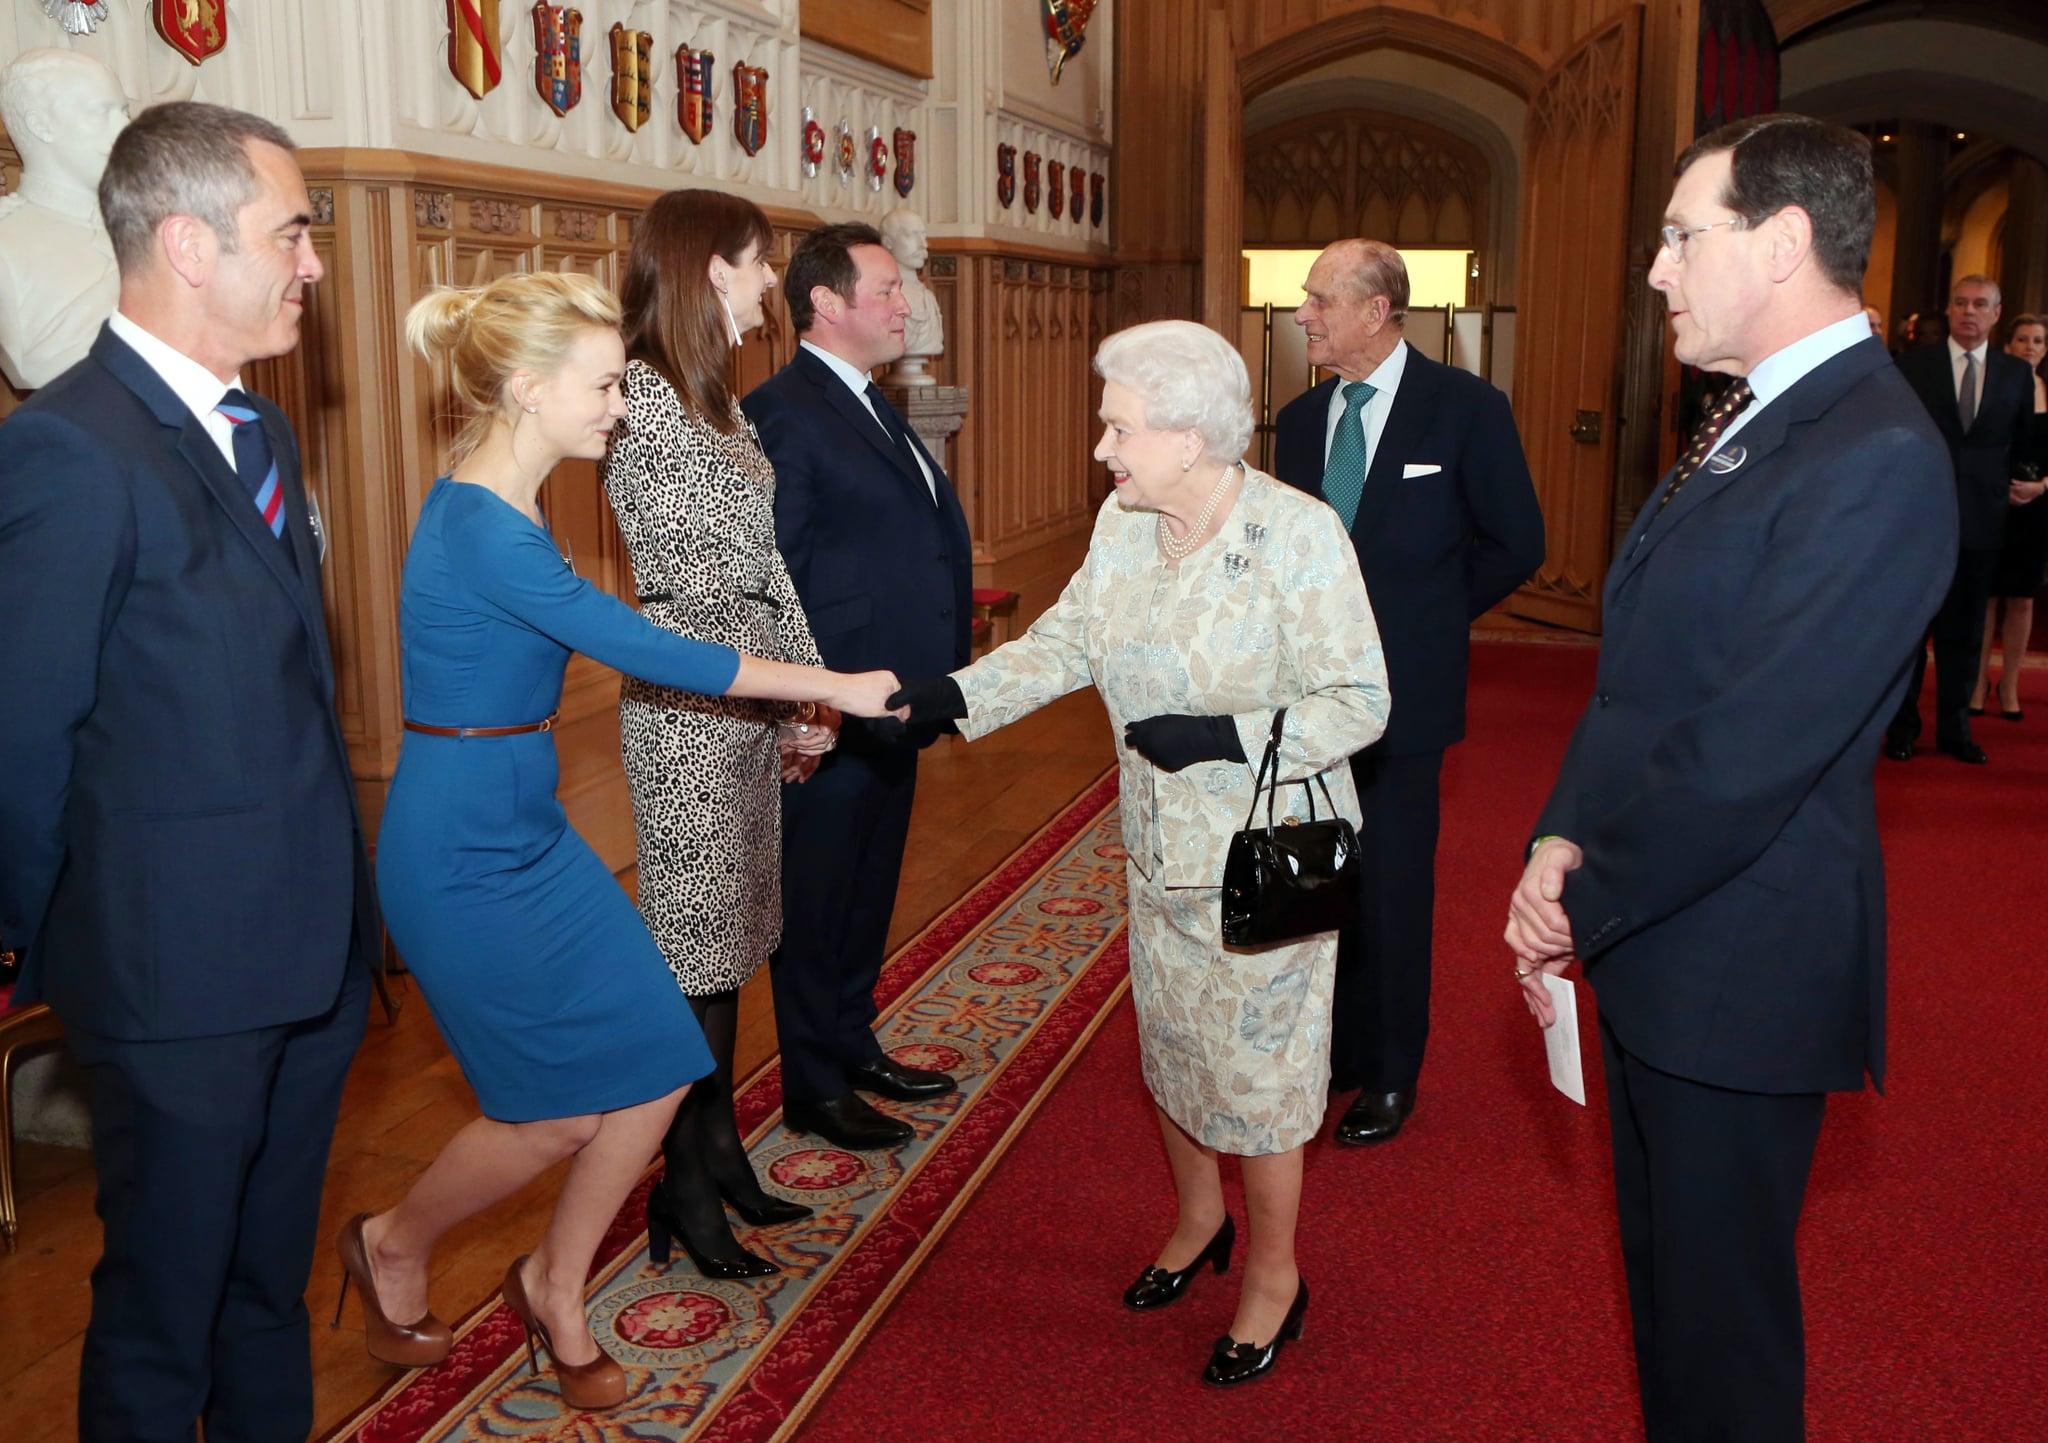 Carey Mulligan met Queen Elizabeth at a reception for the British film industry at Windsor Castle in April 2013.